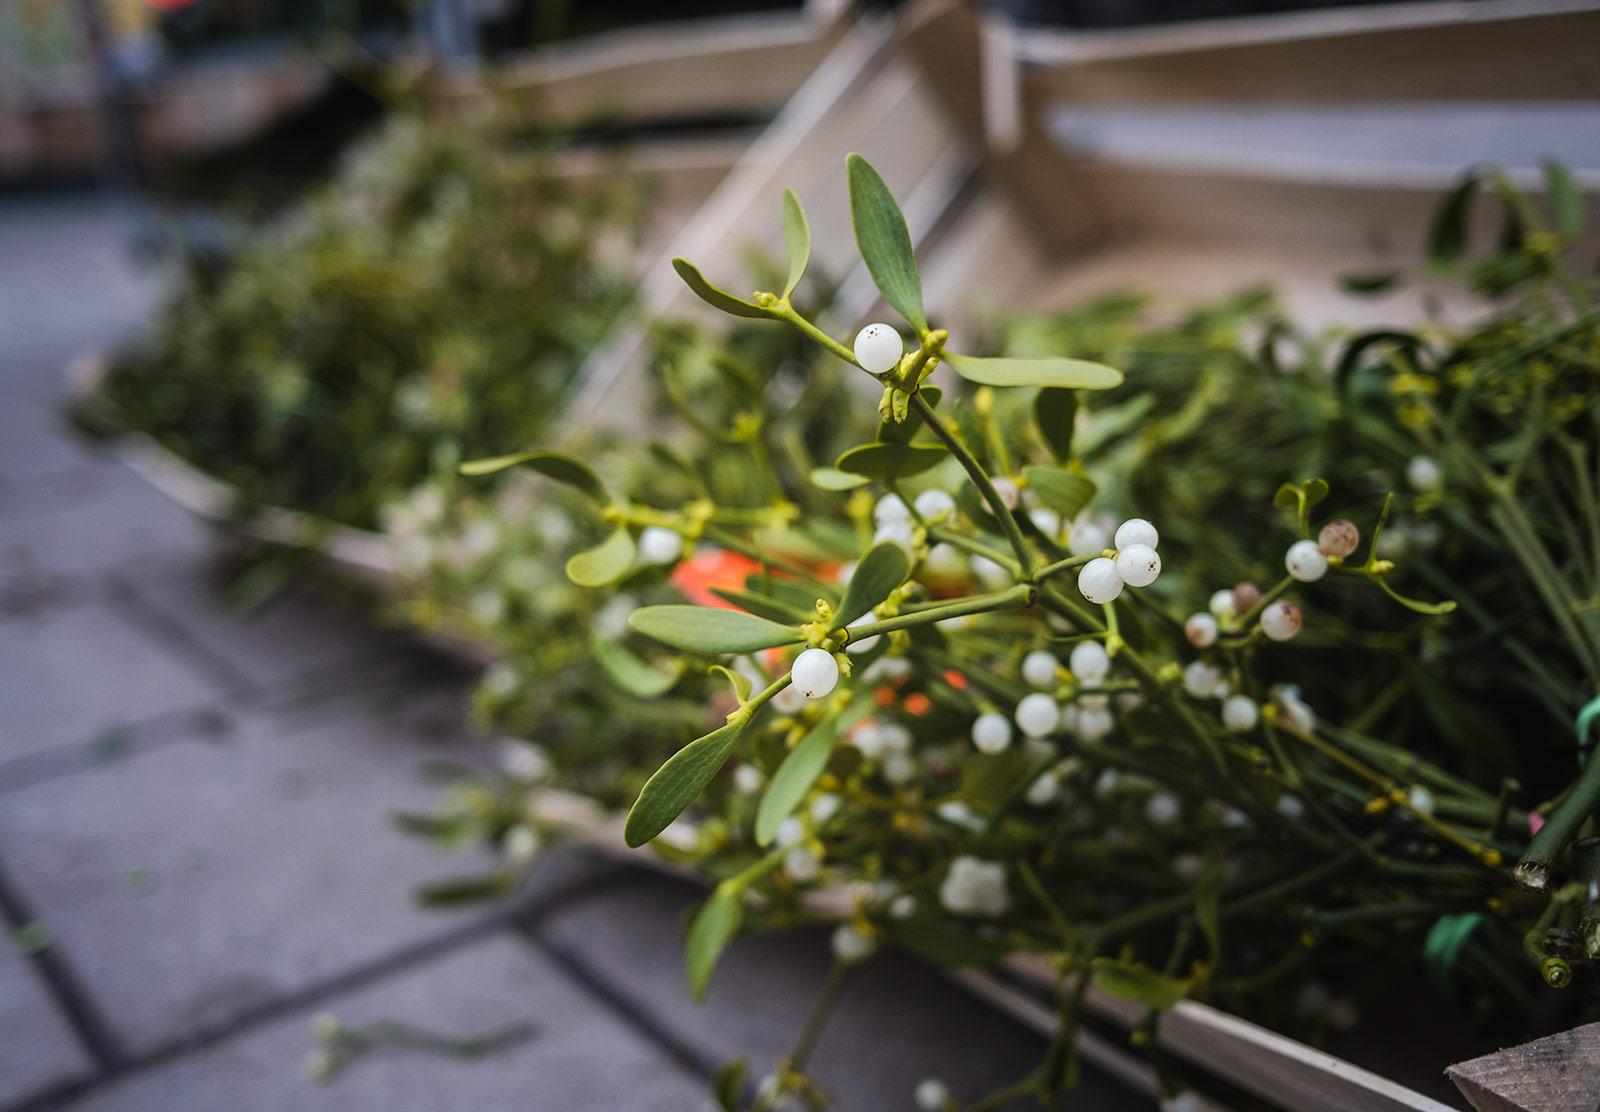 Box of mistletoe